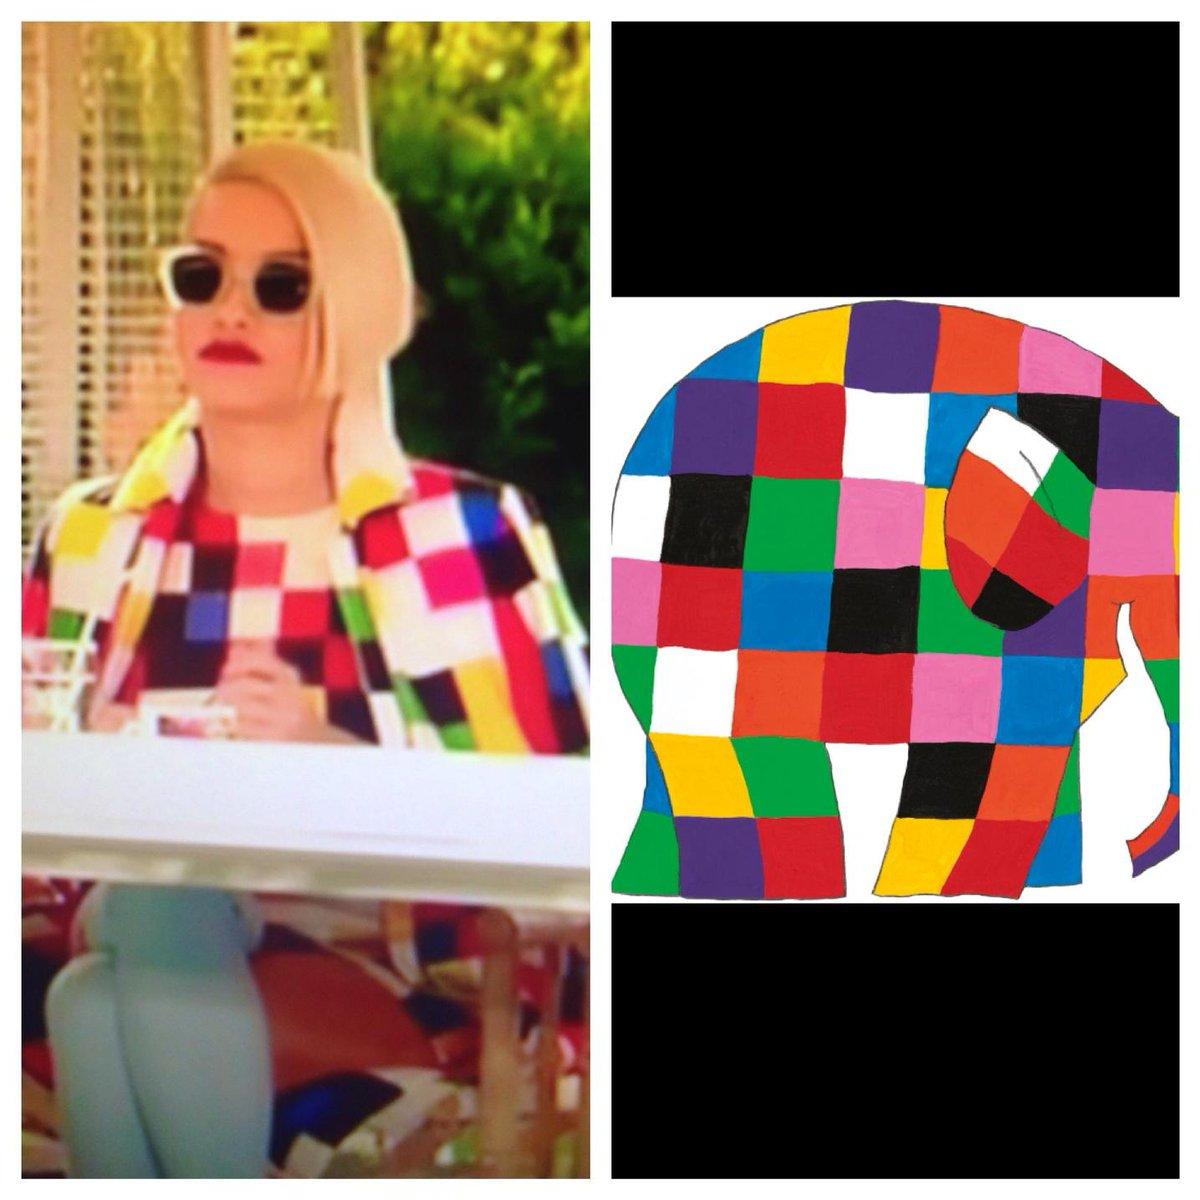 Is it just me or does Rita Ora look like Elmer? #Xfactor http://t.co/J6sDxfBj2C